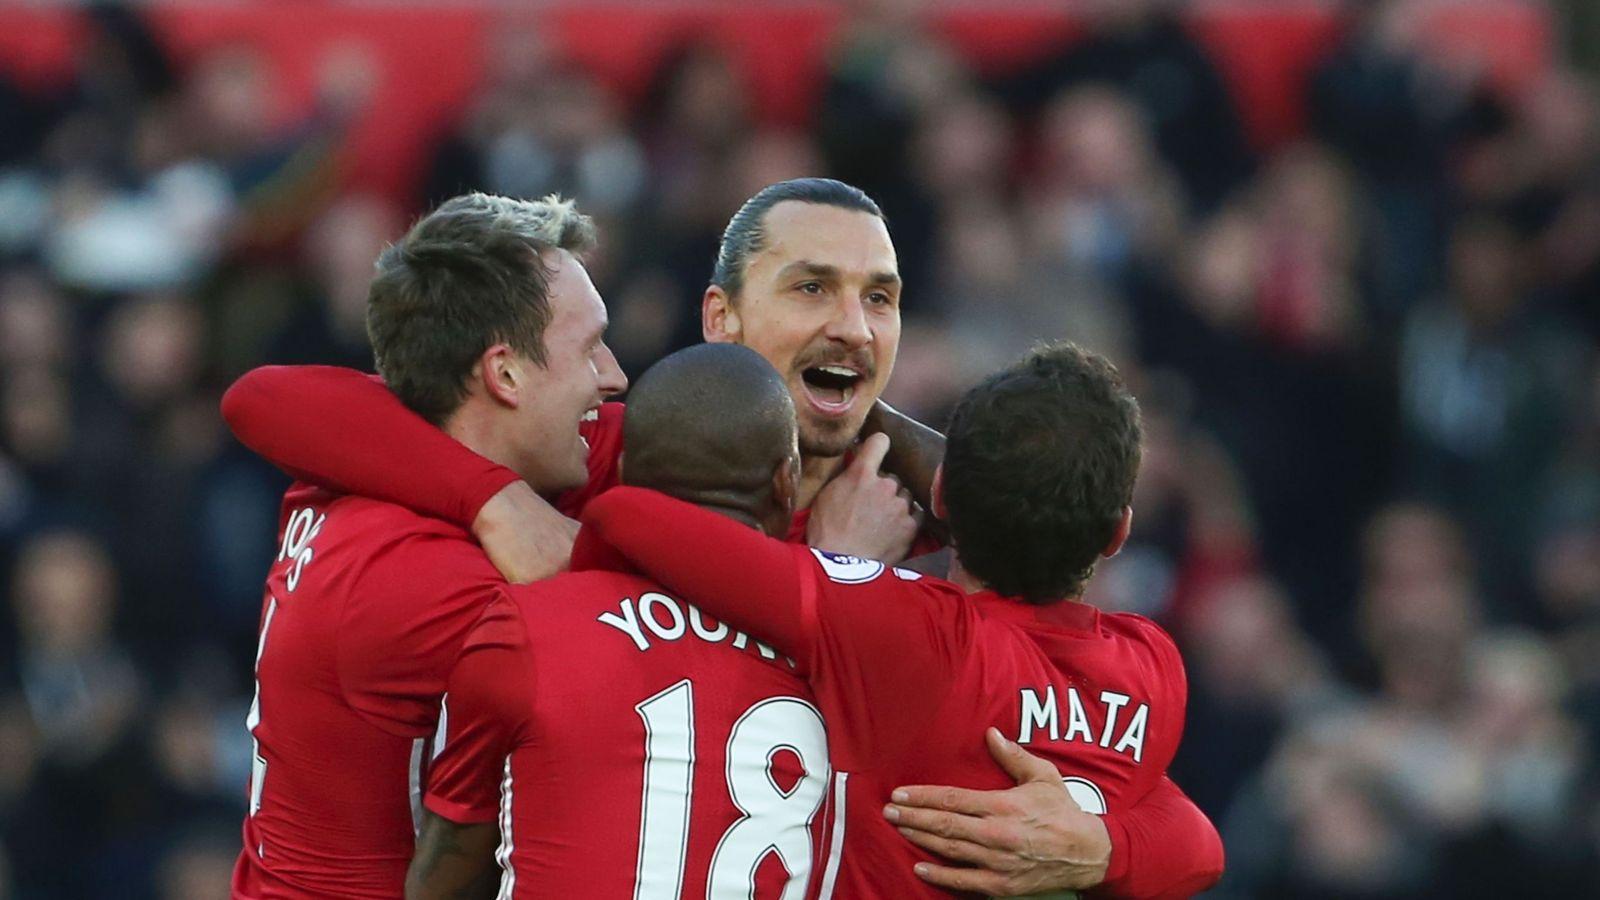 Swansea 1 - 3 Man Utd - Match Report & Highlights